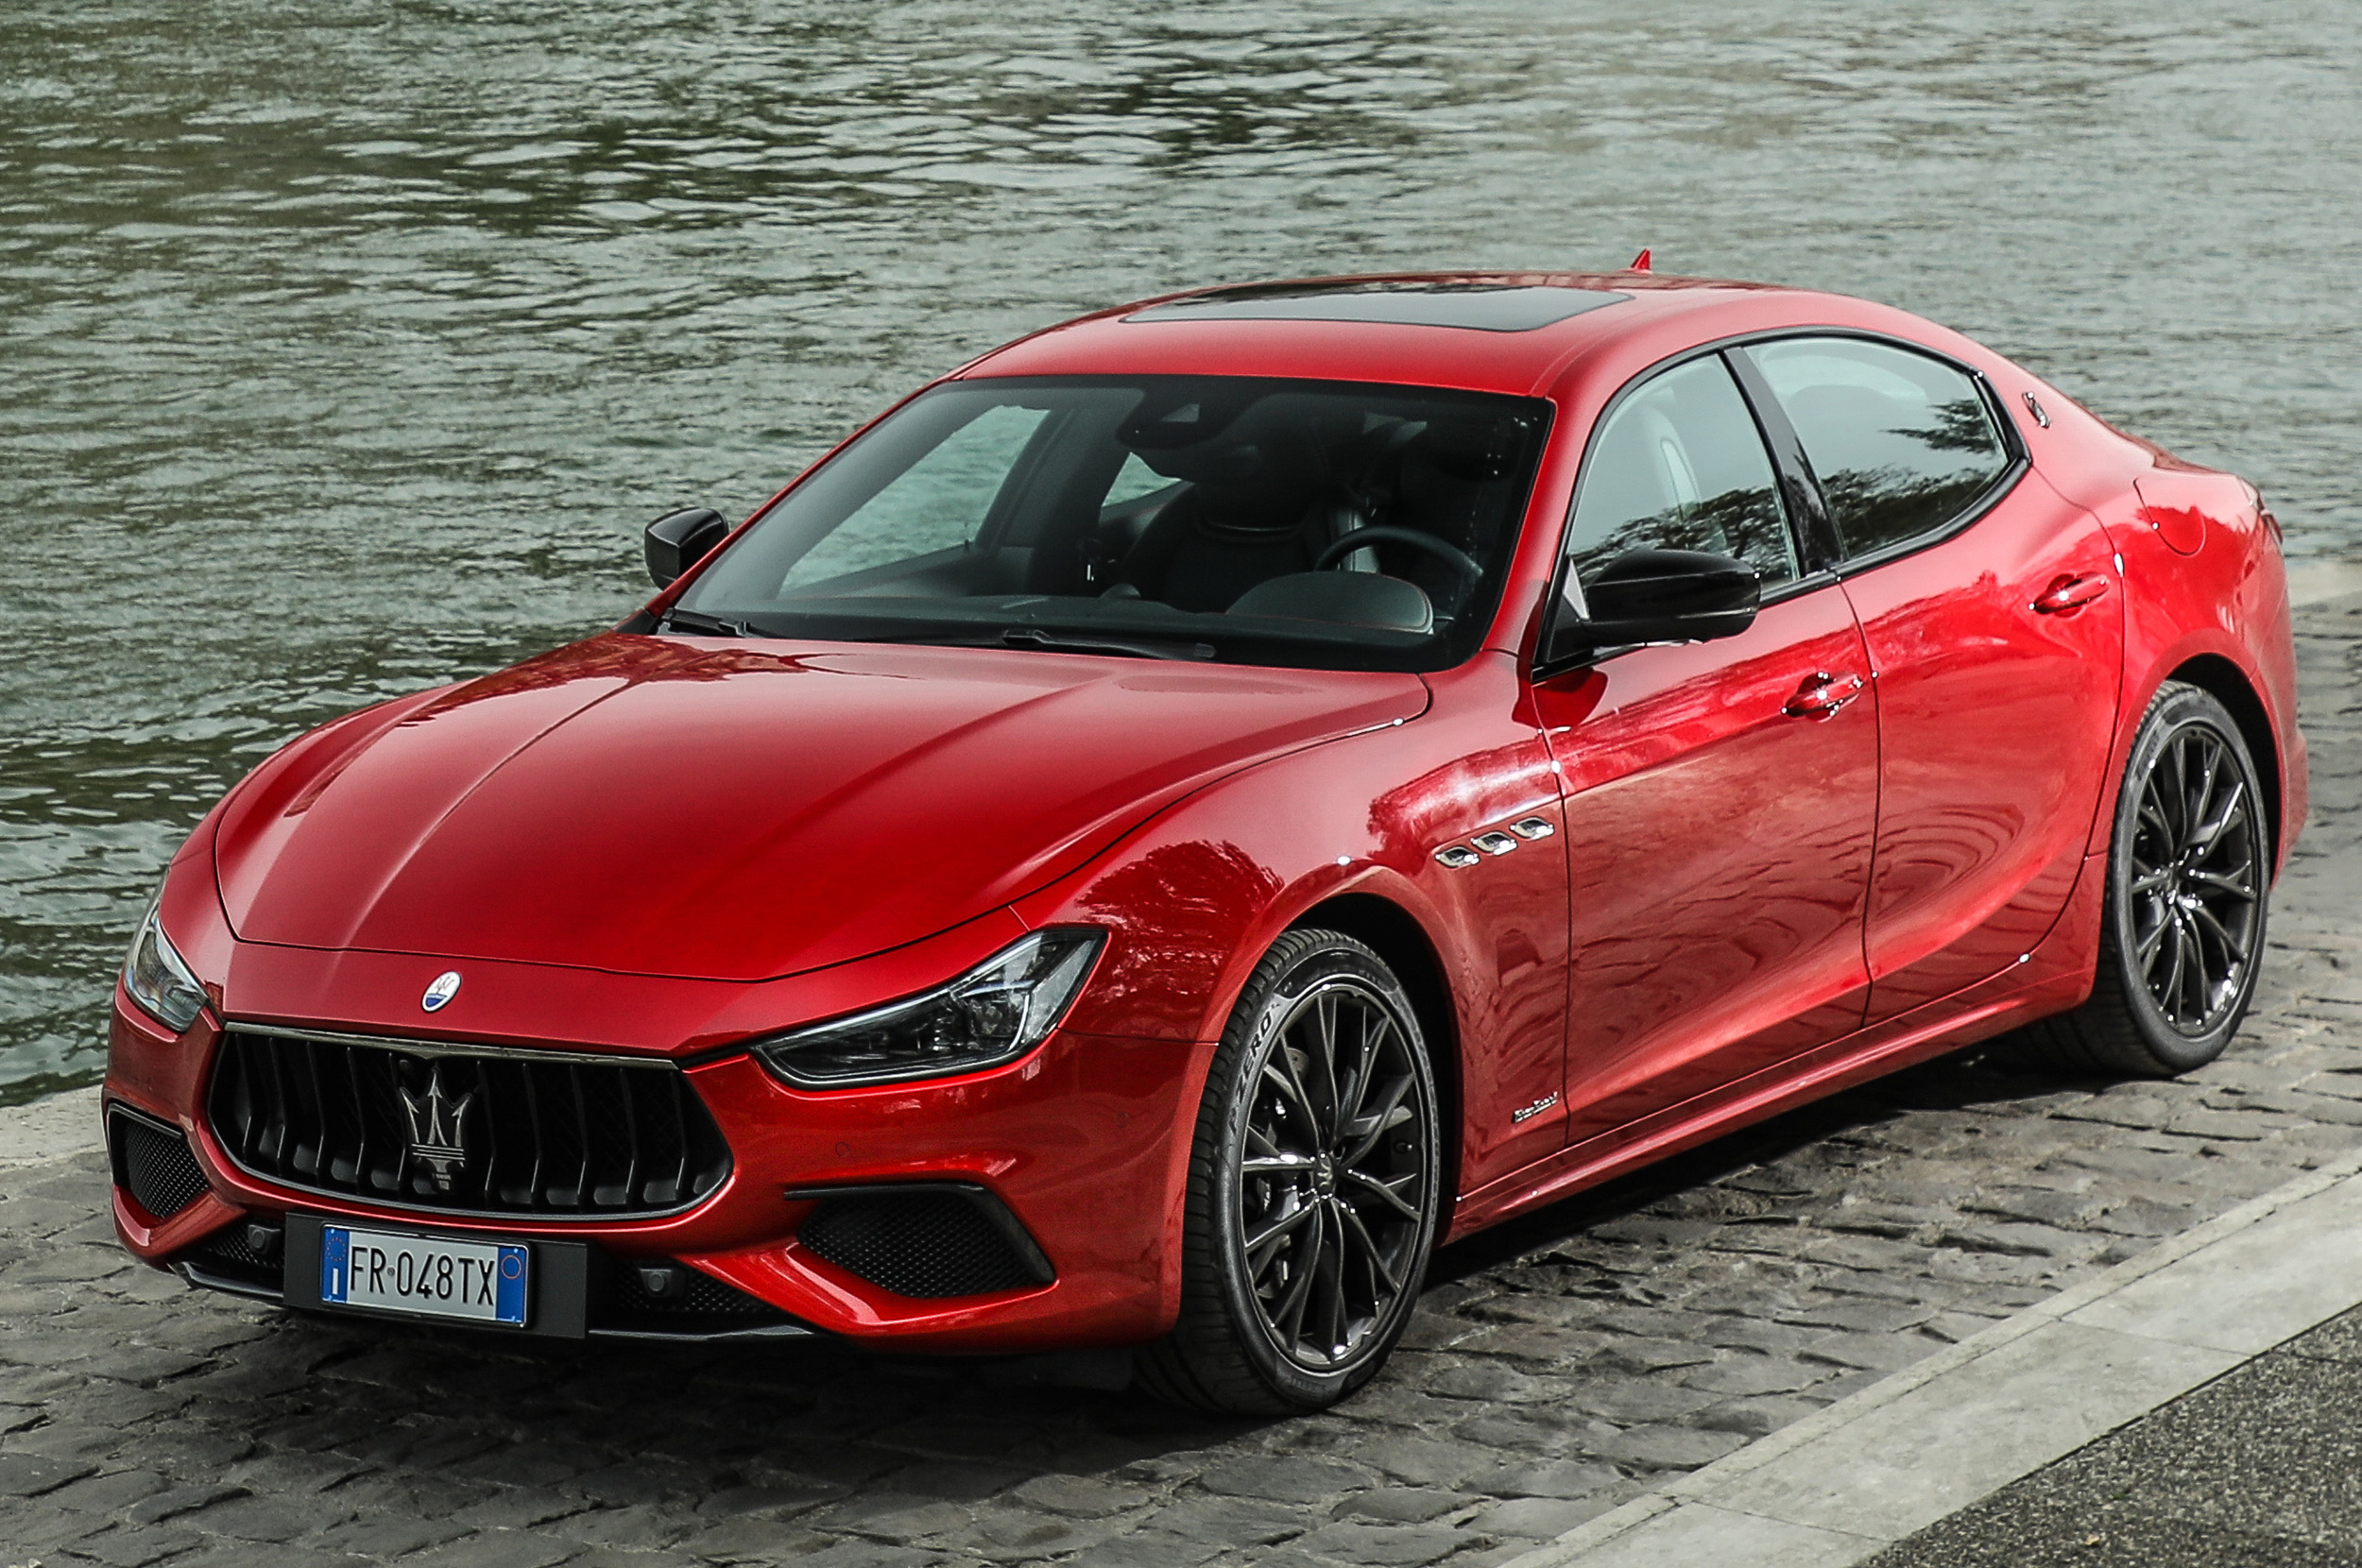 2020 Maserati Ghibli Overview , MSN Autos